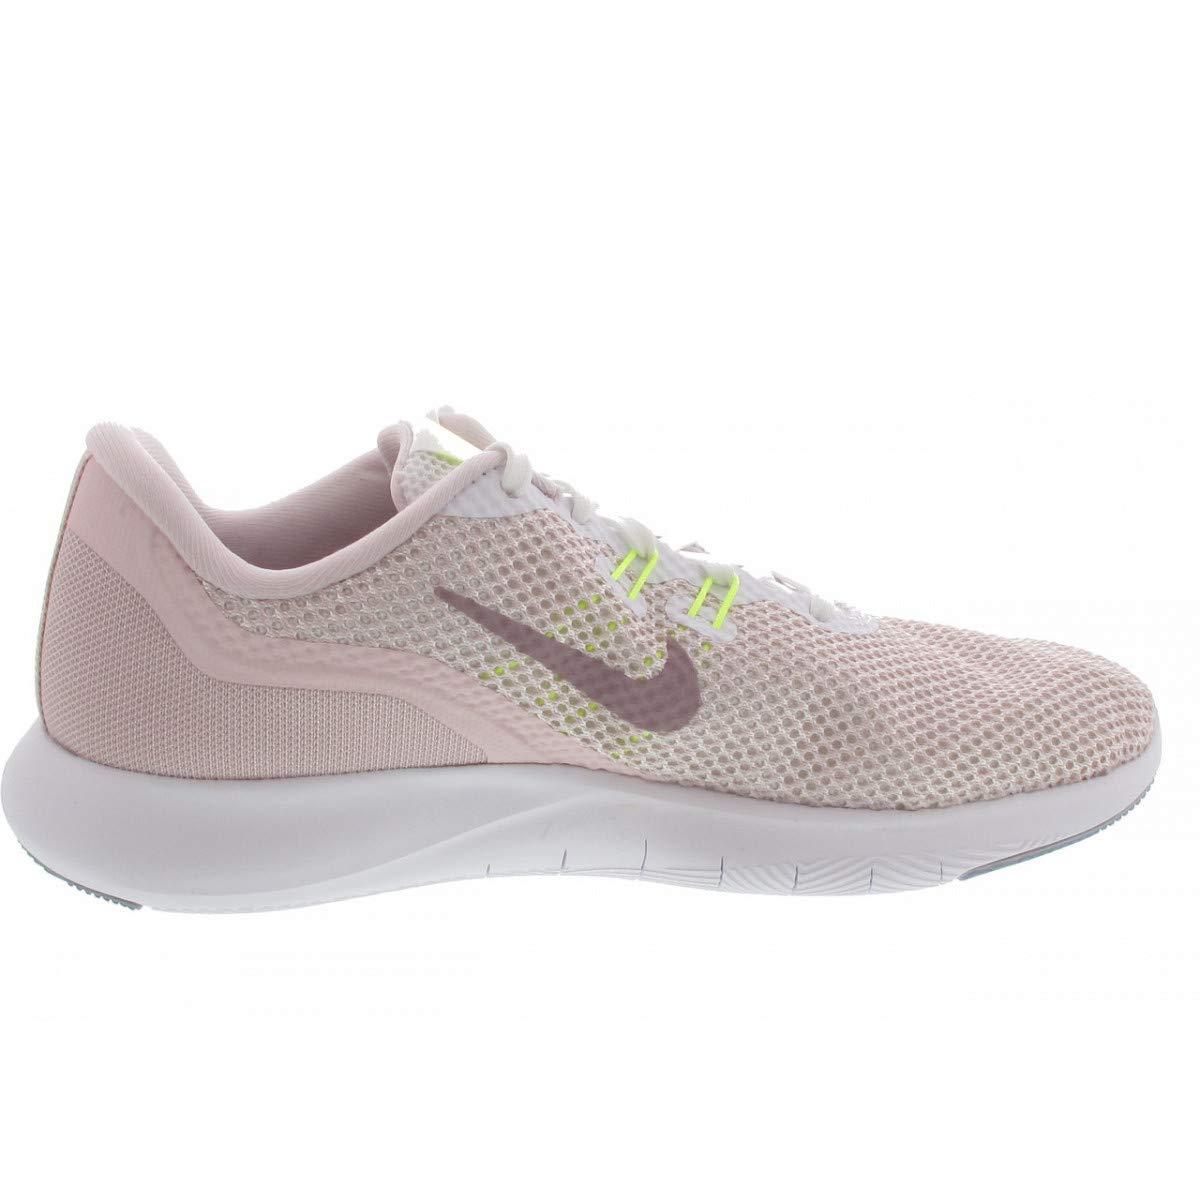 Nike Damen Damen Damen Trainingsschuh Flex Trainer 7 Laufschuhe 5cea0b